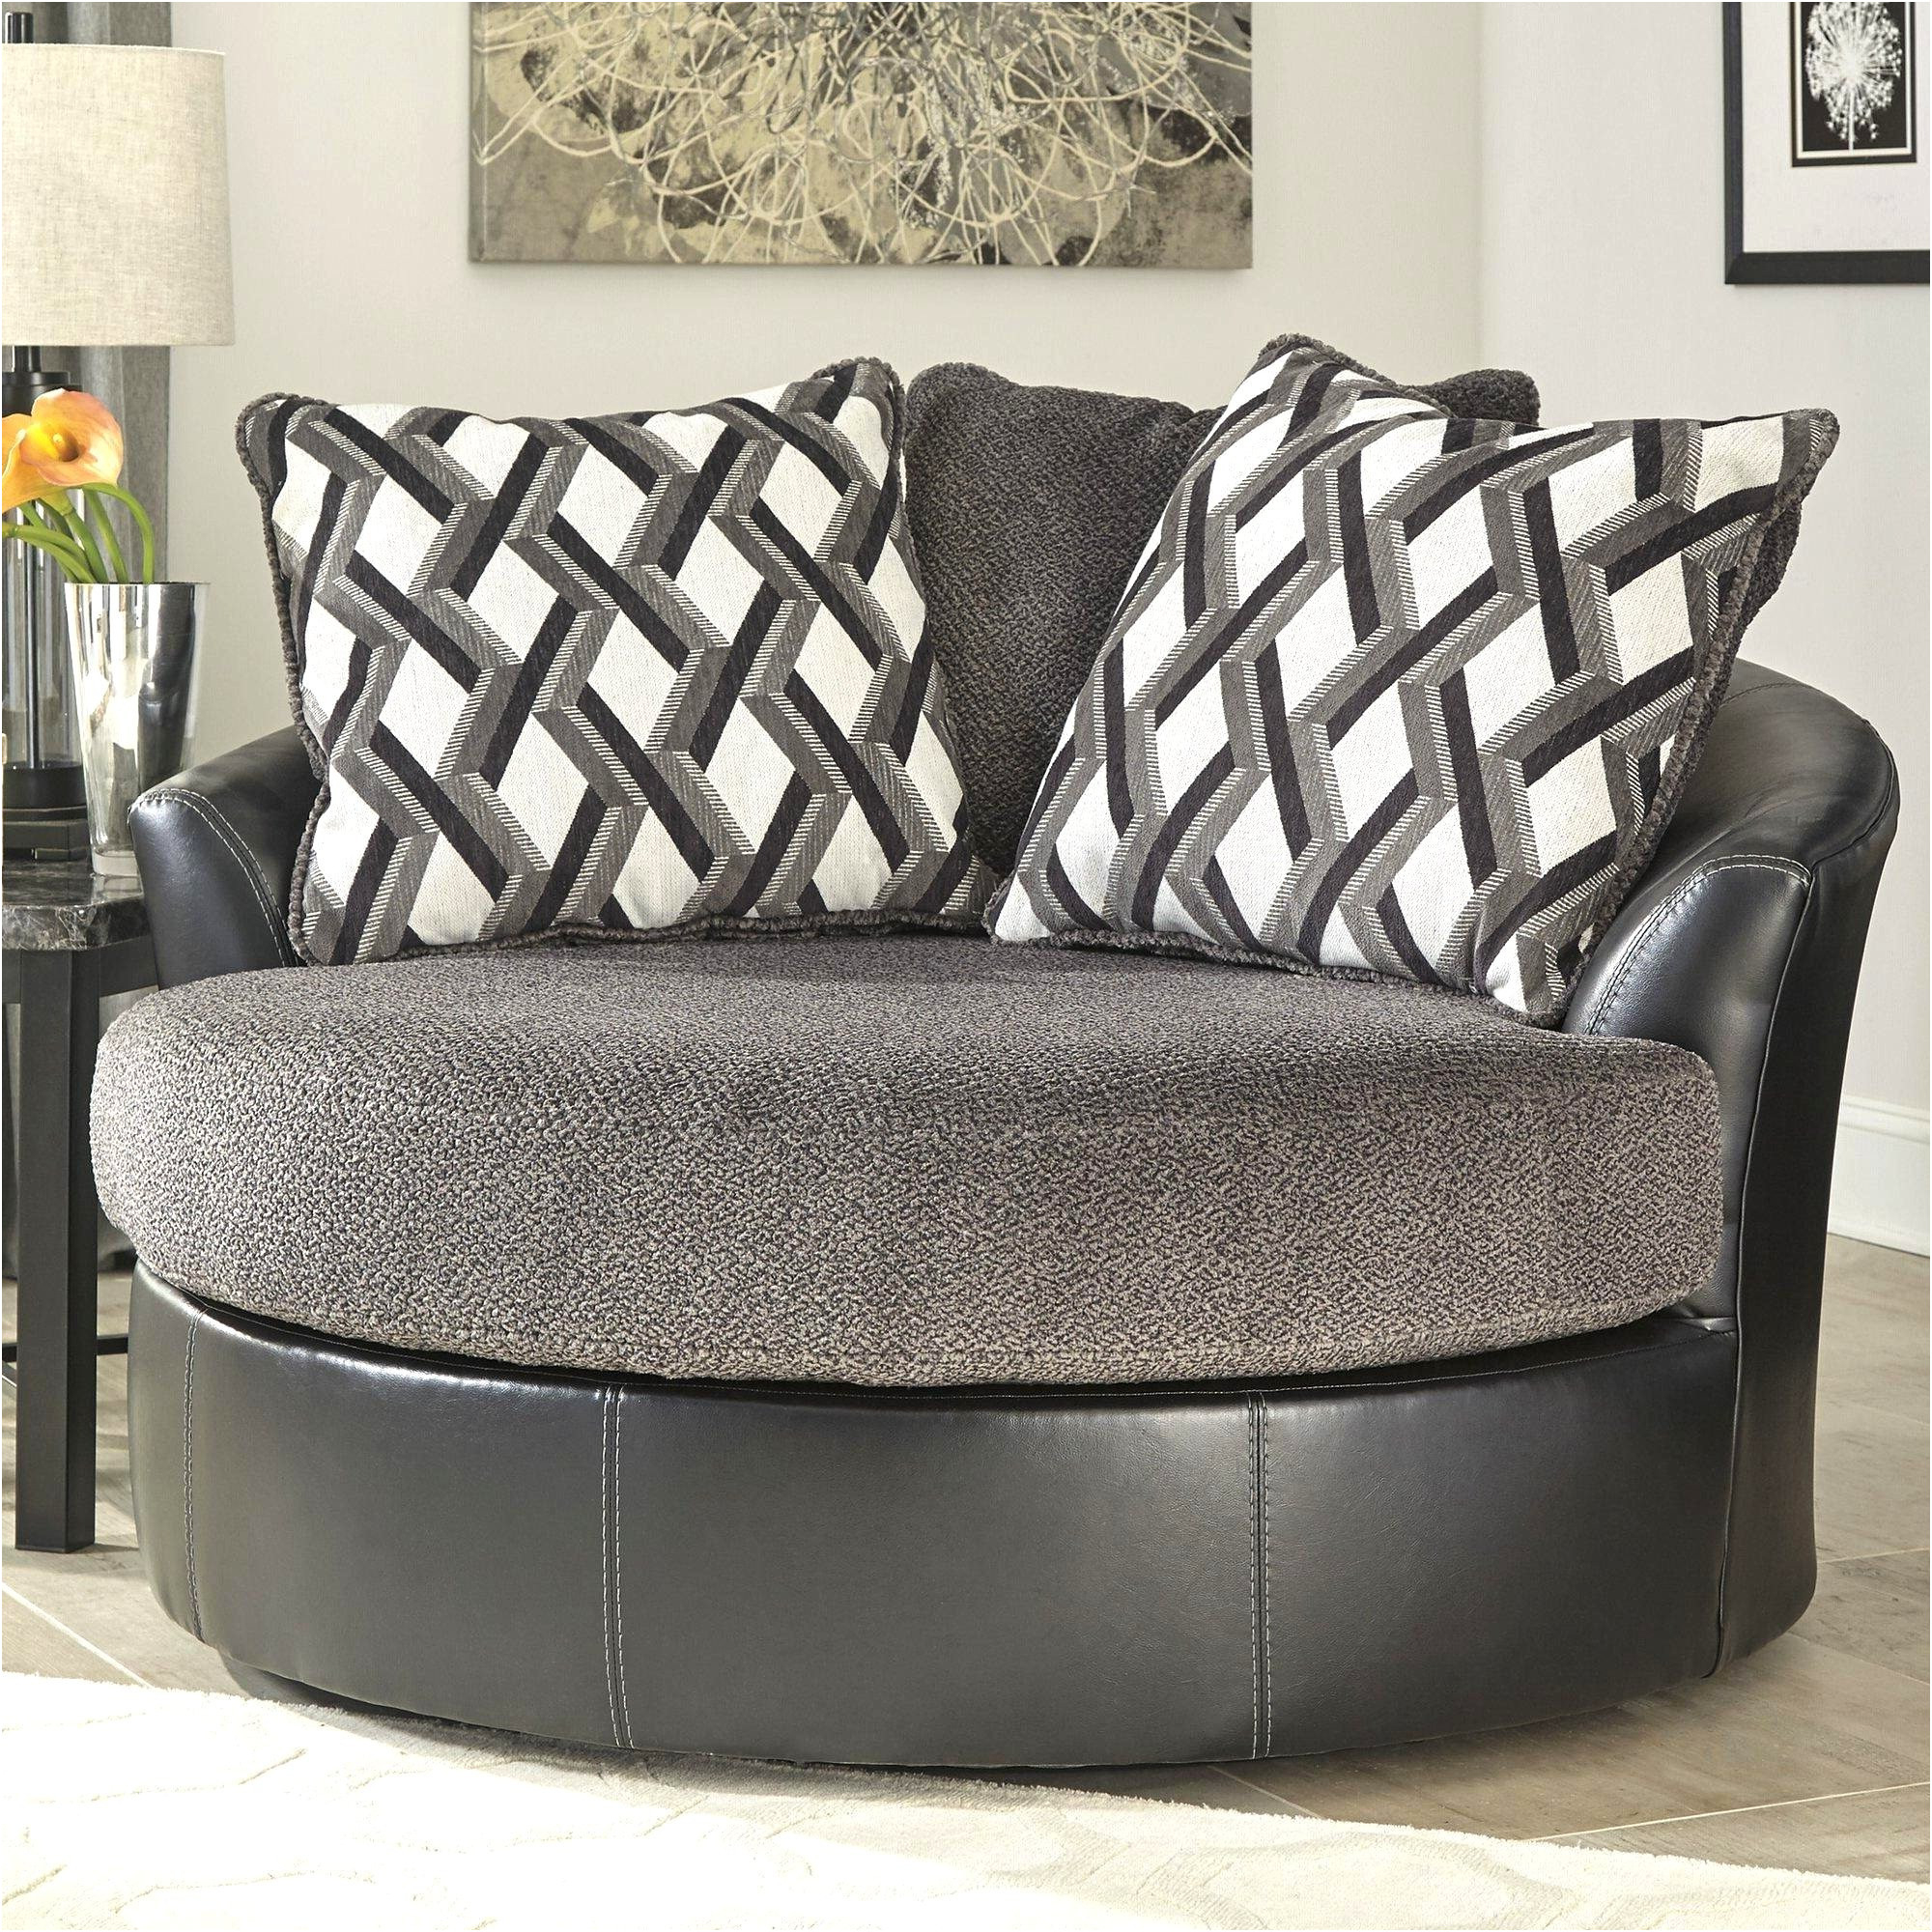 Sofa Relax Ikea Qwdq Charmant Grand Canape Ikea Avec Canape sofa Schà N Relaxfunktion sofa